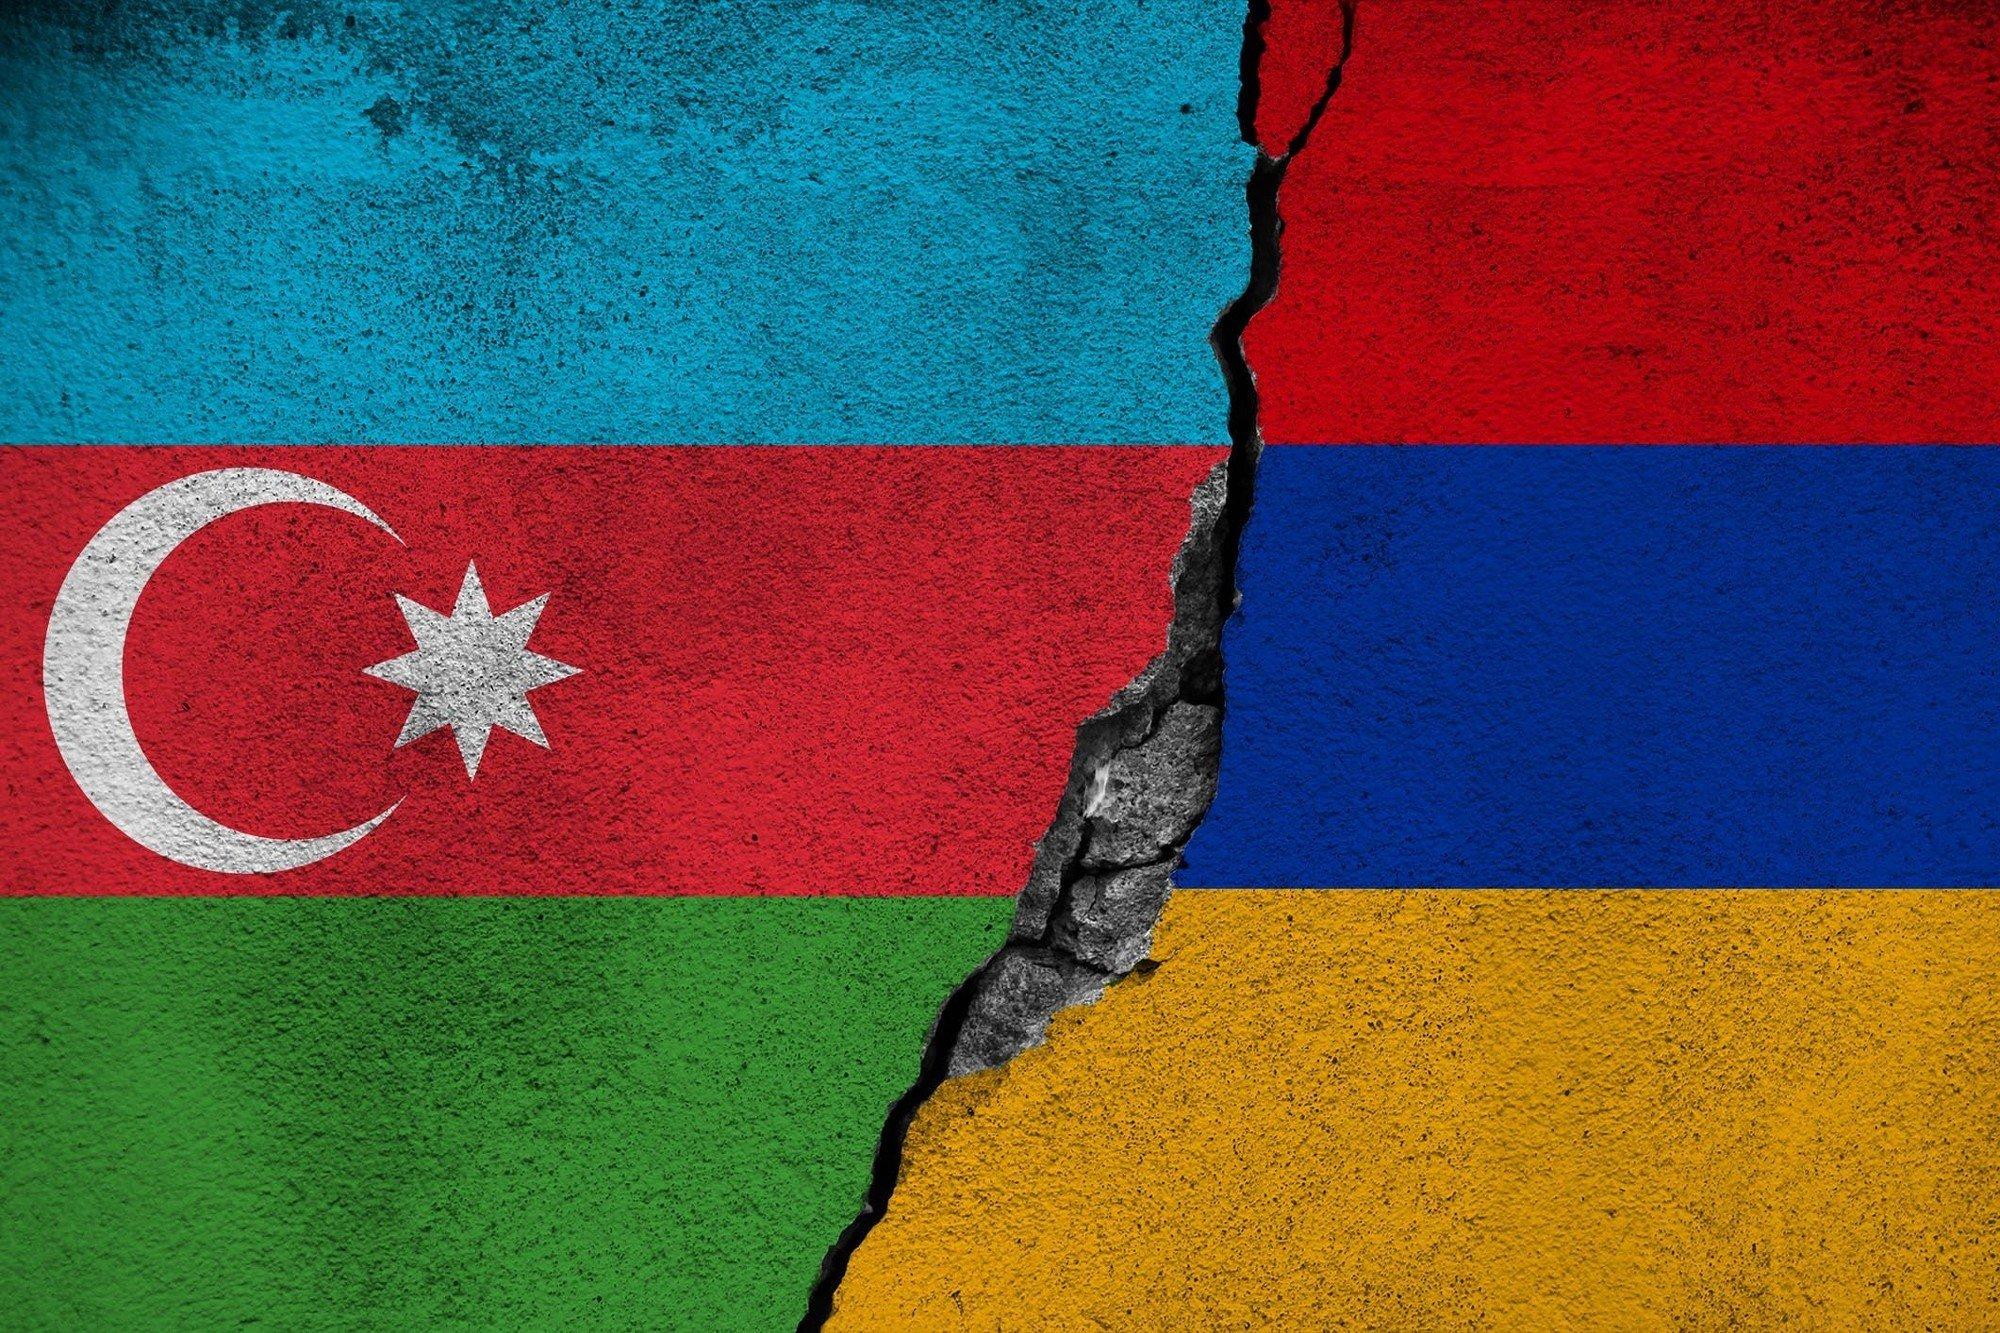 Войска Азербайджана заняли Агдамский район